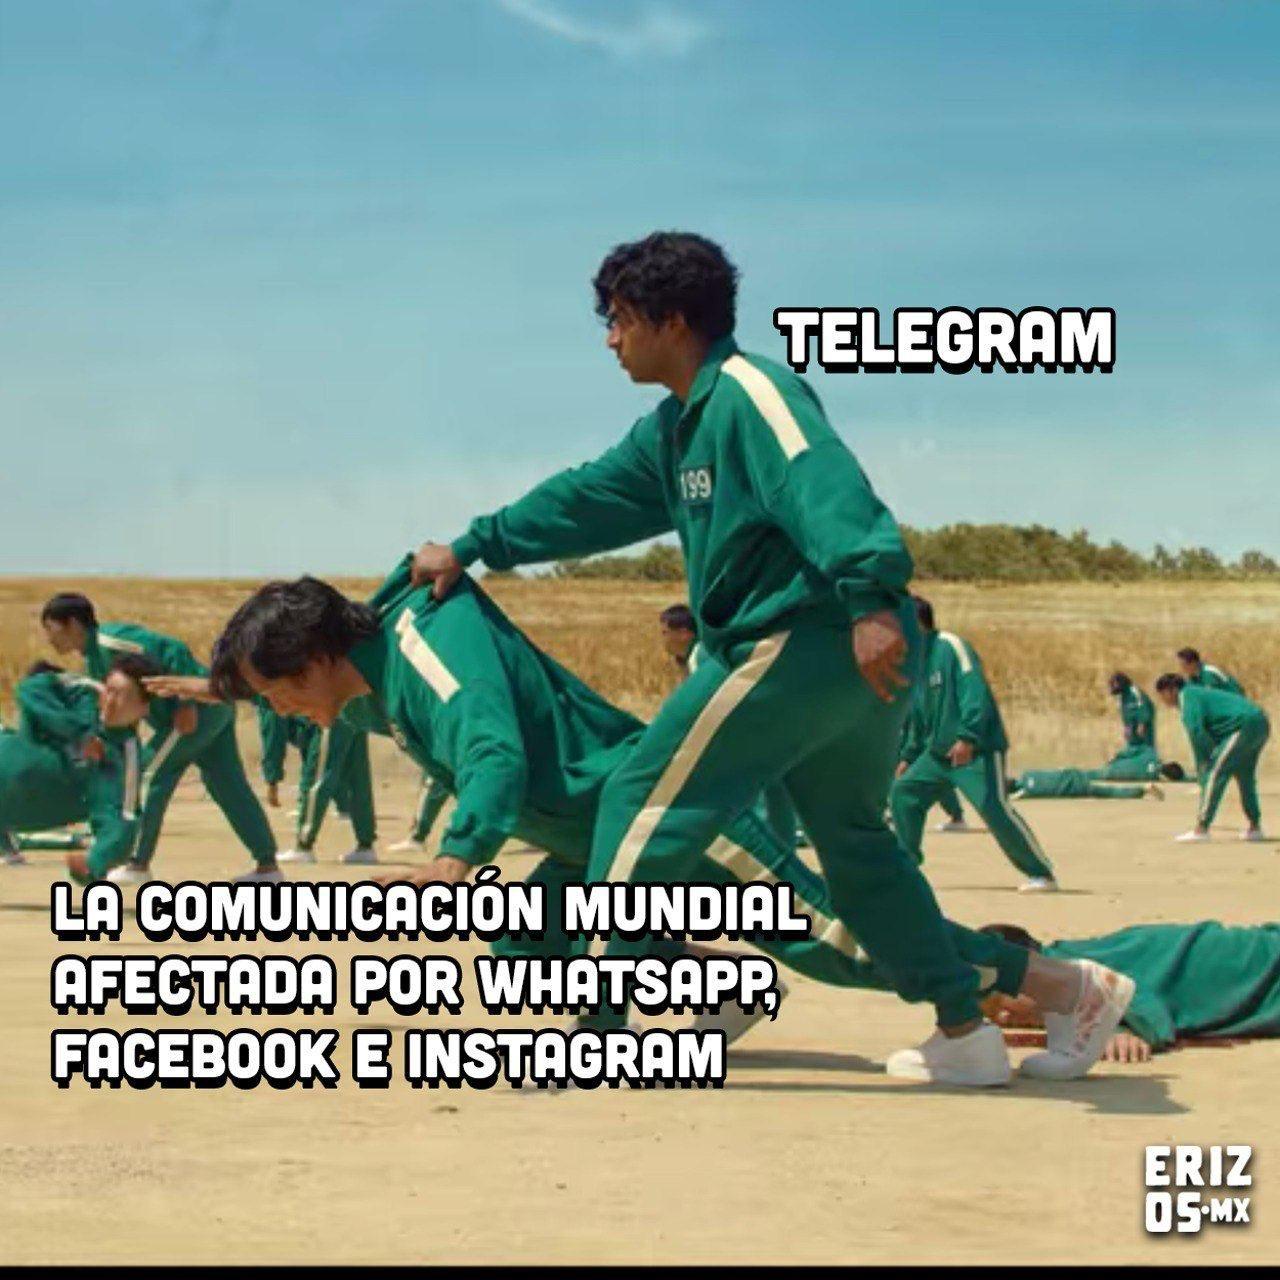 Telegram meme caida redes sociales